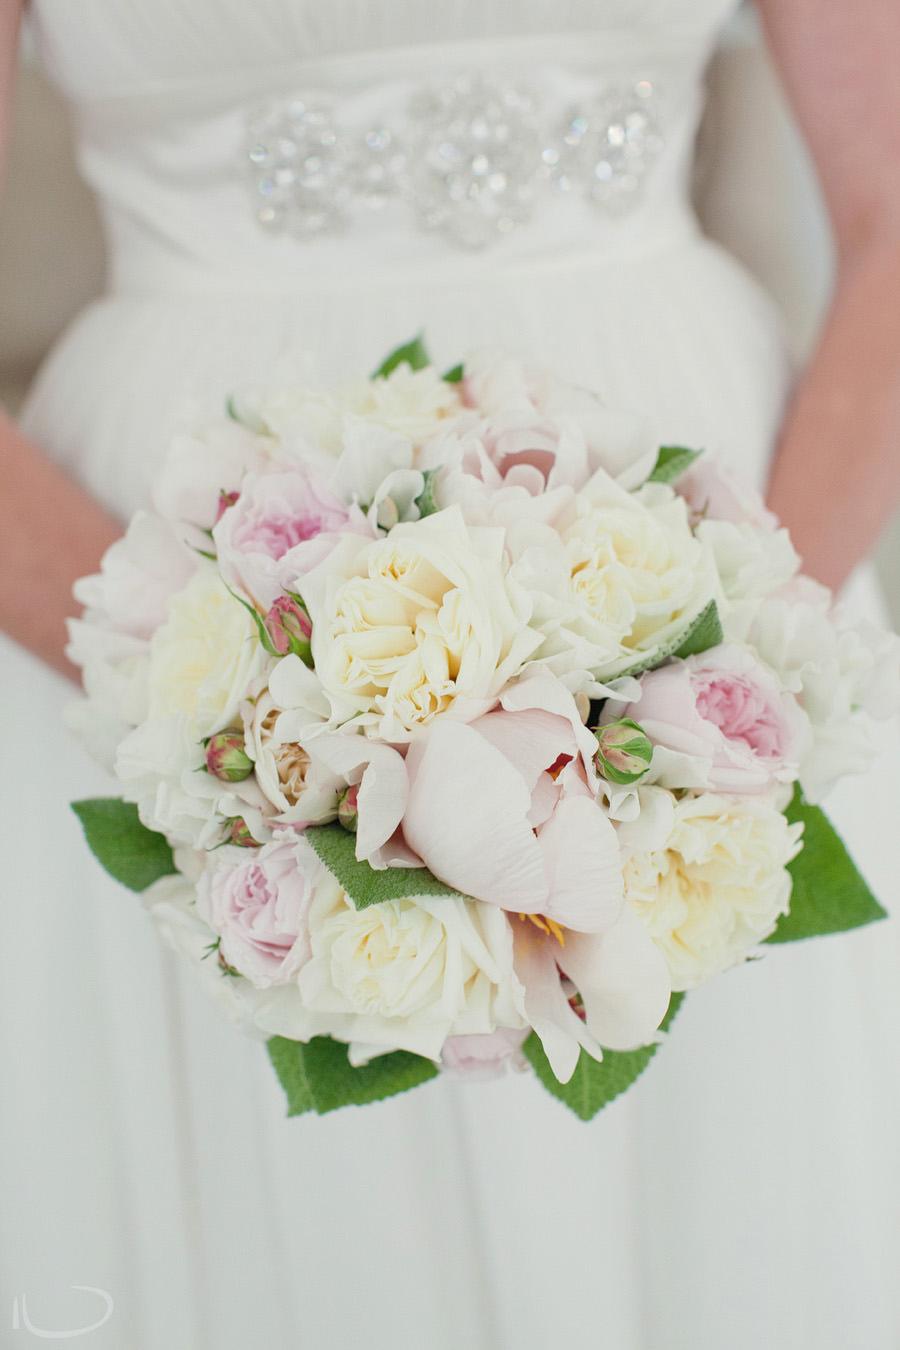 Cronulla Wedding Photographer: Bridal bouquet